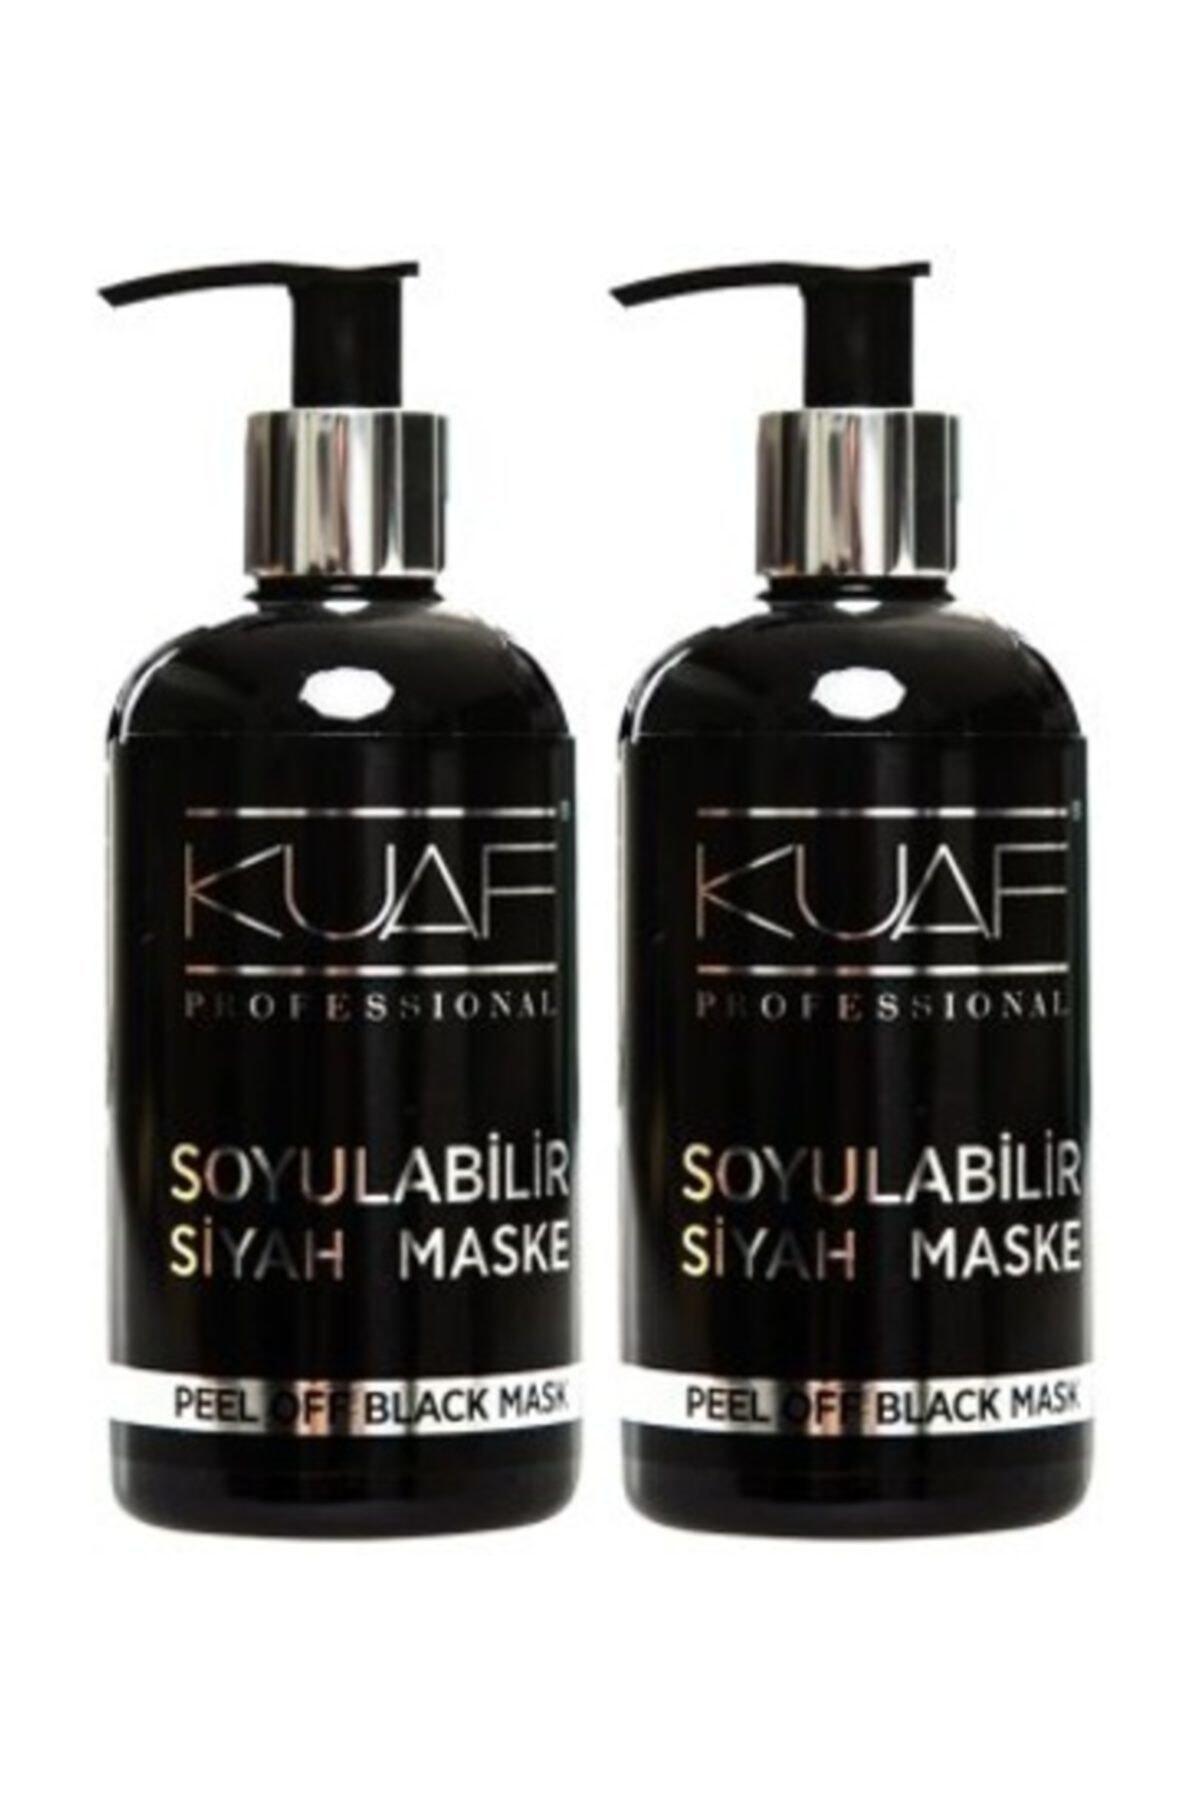 Soyulabilir Siyah Cilt Maskesi Pompalı 250 ml X 2 Adet